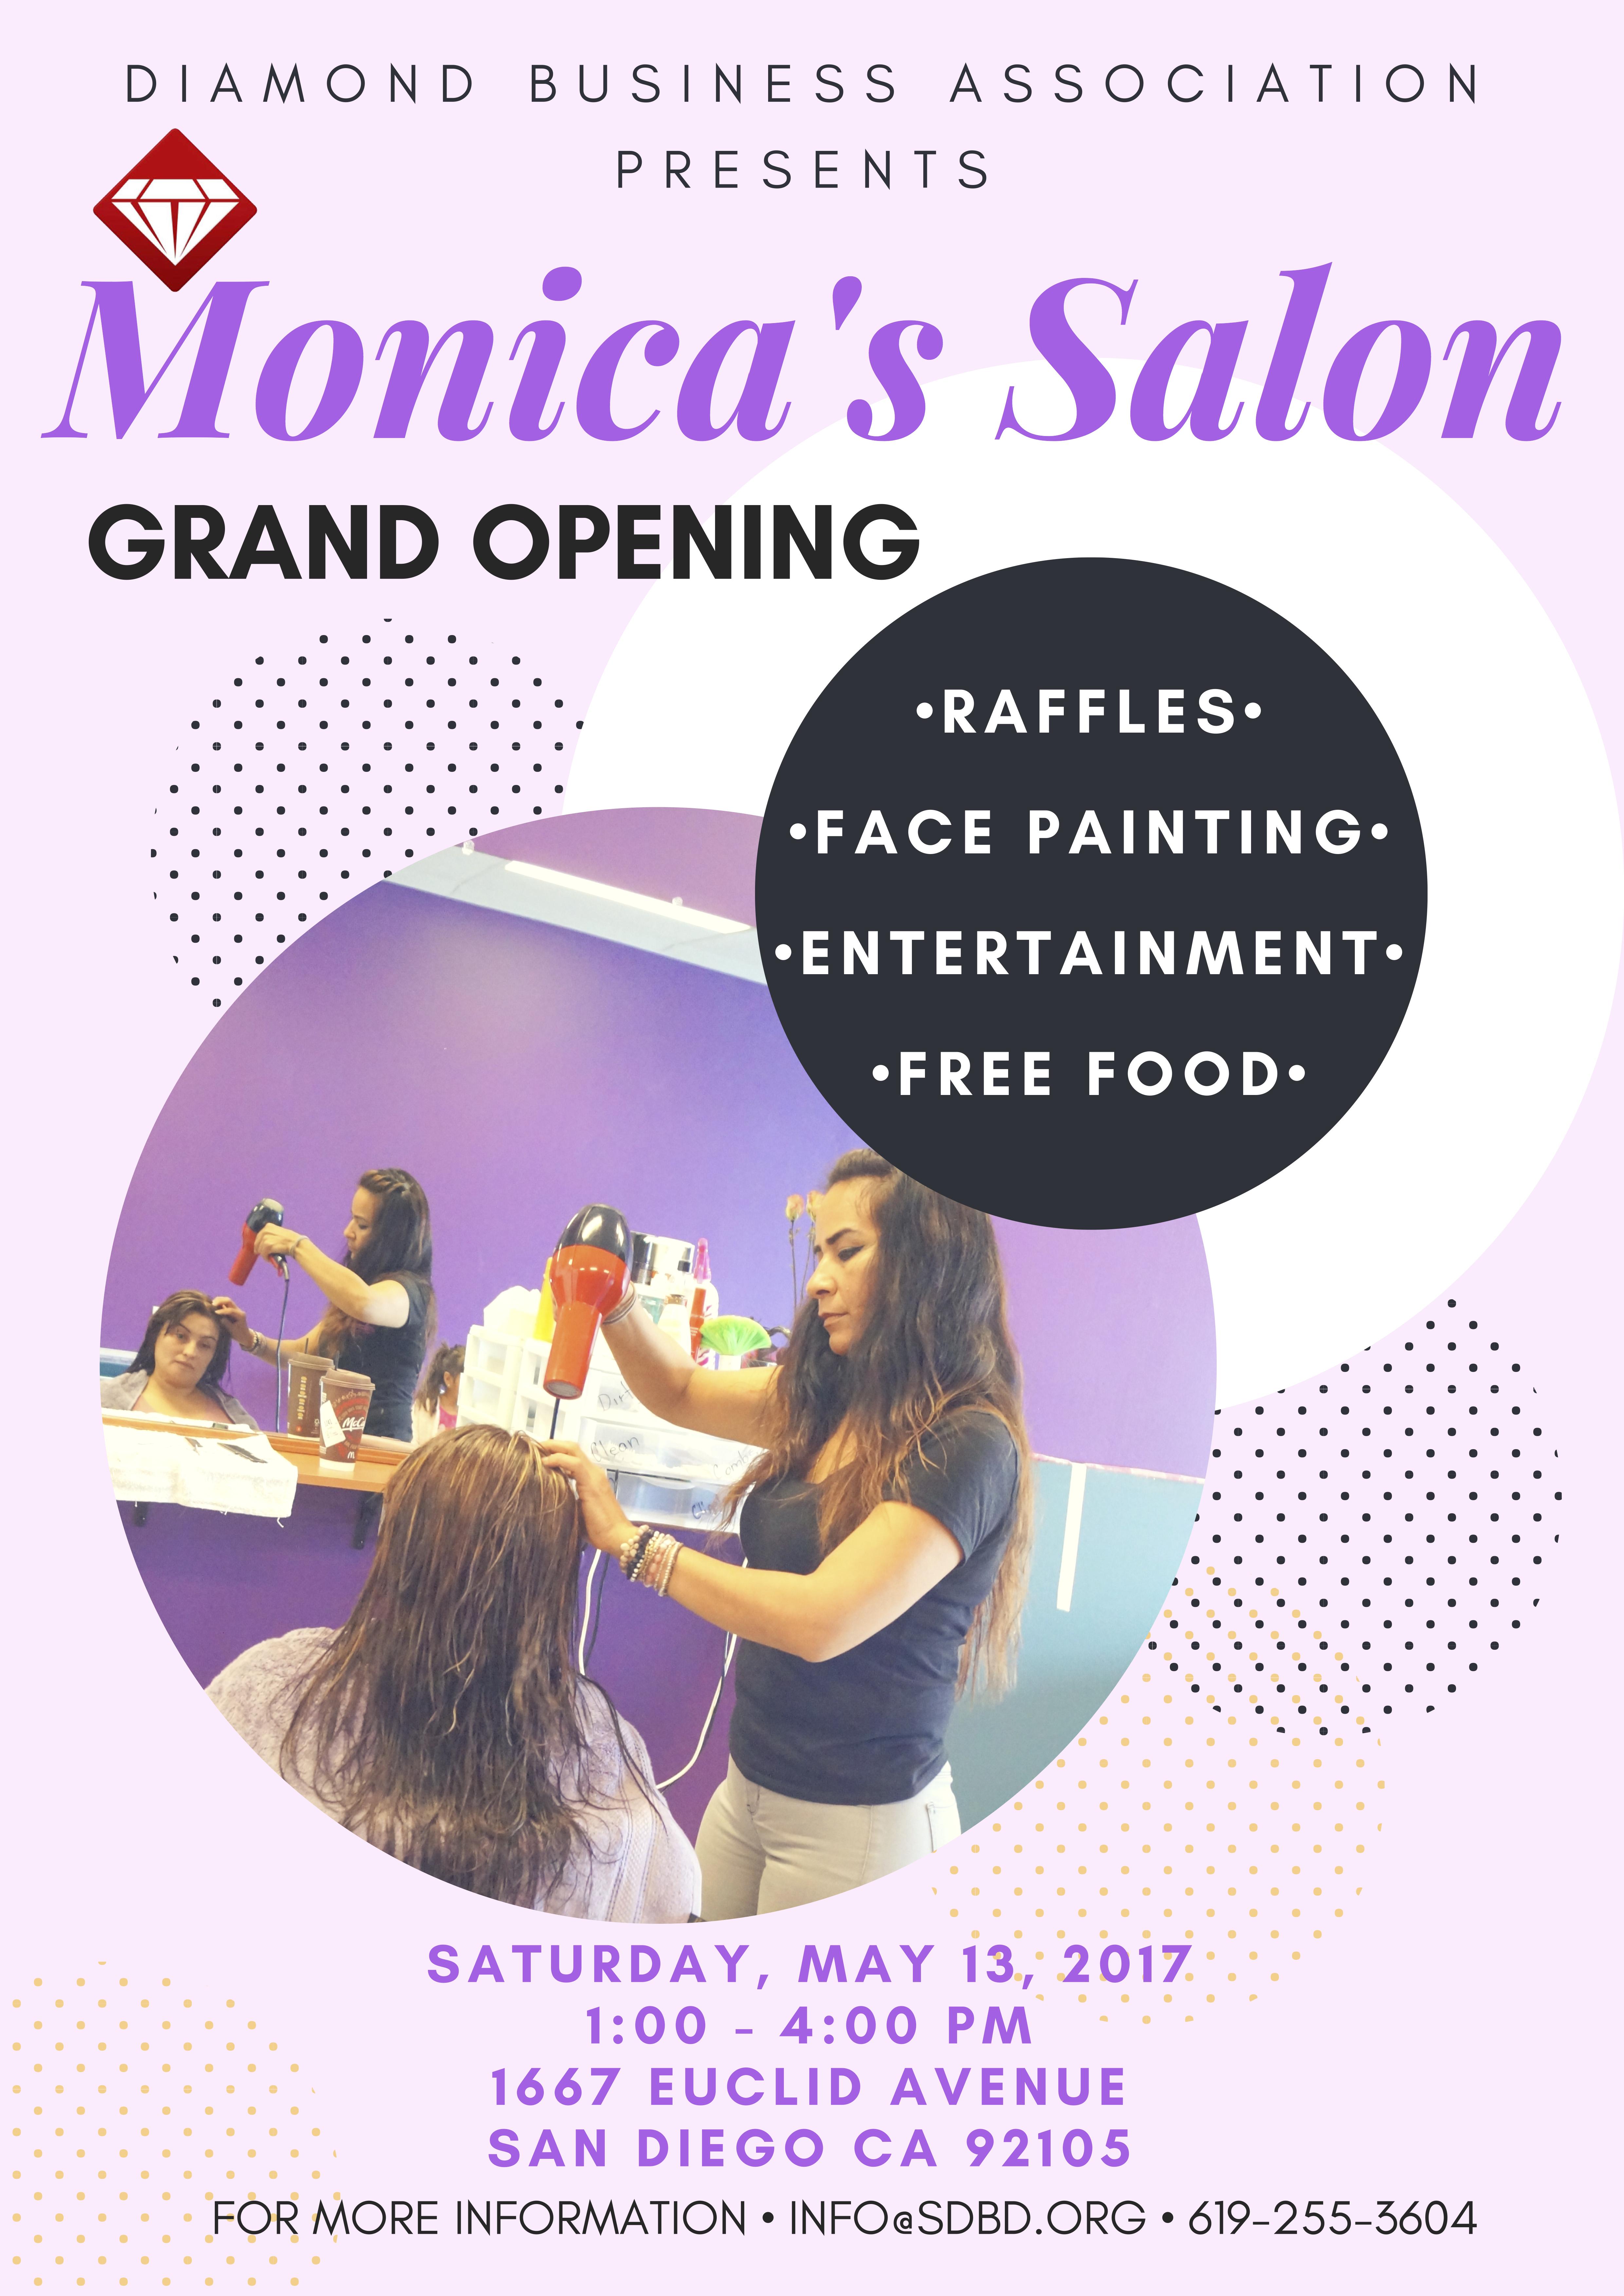 Monica's Salon Grand Opening